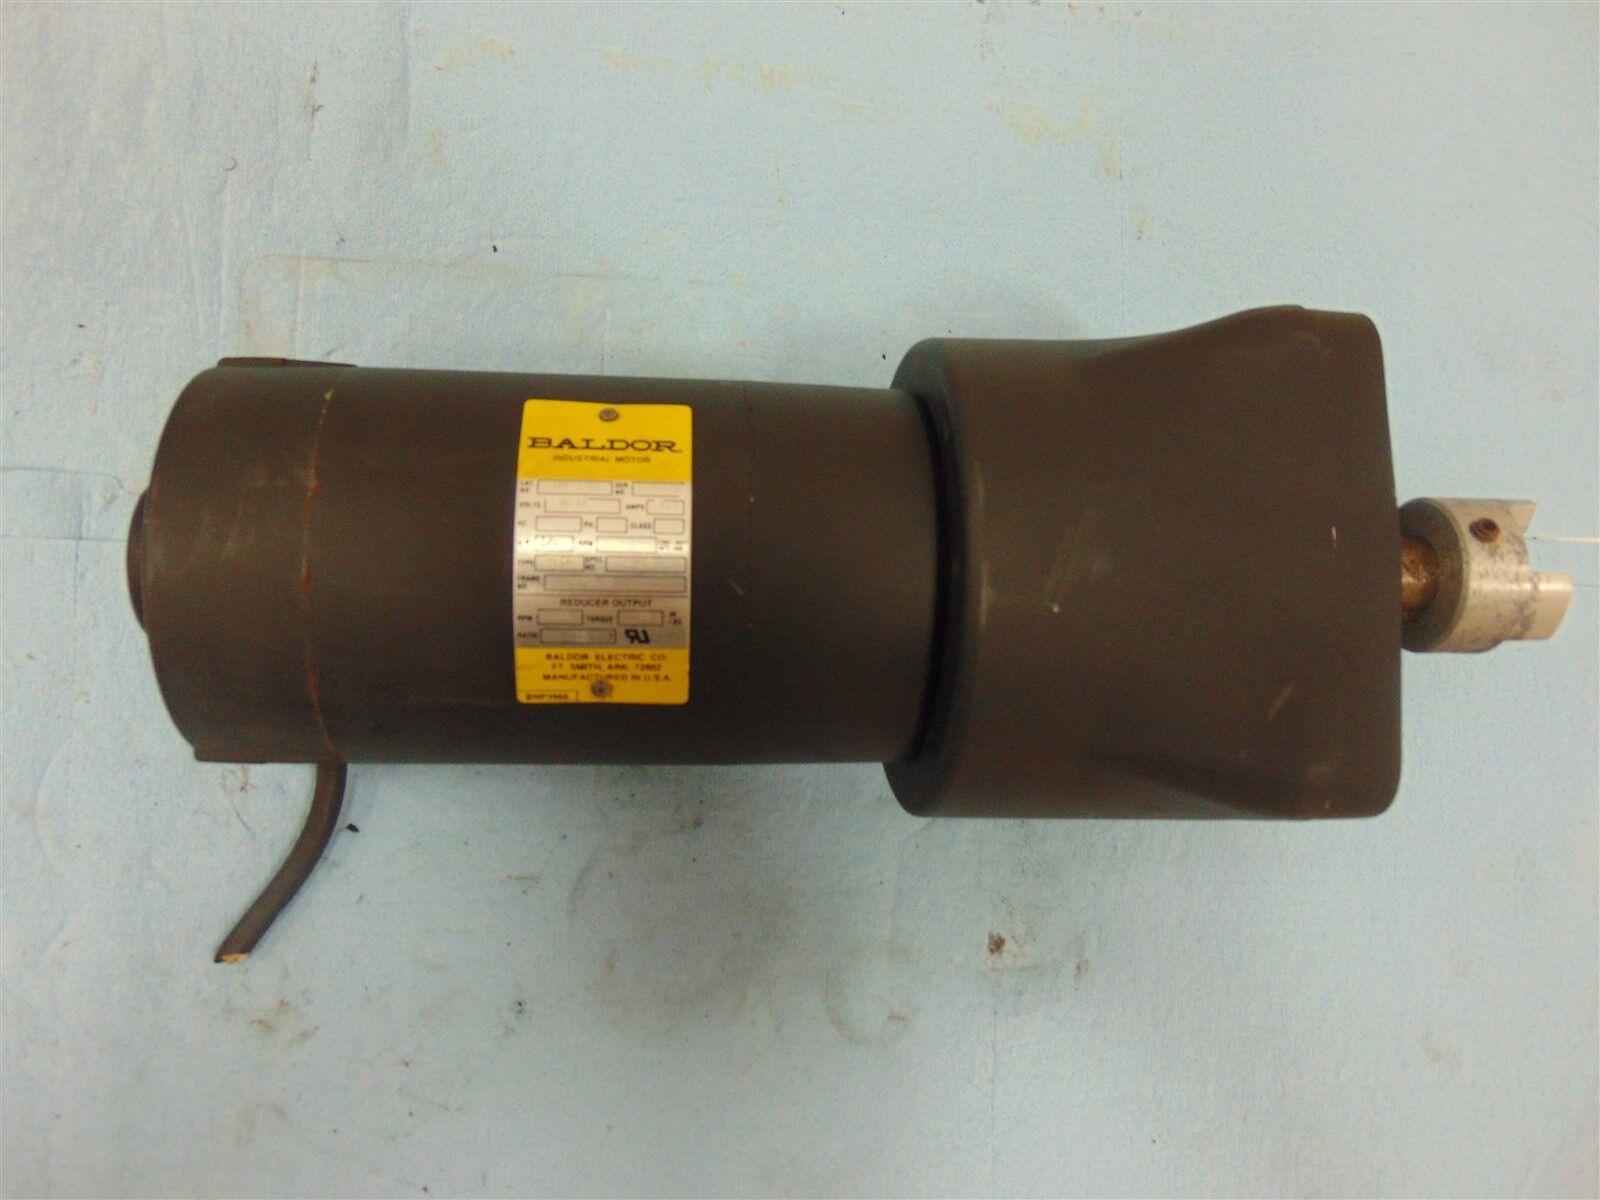 Baldor GPP 7452 Motor 1/4 HP 2.4A 90DC w/ Reducer 105RPM 70in.lbs Ratio 15:1